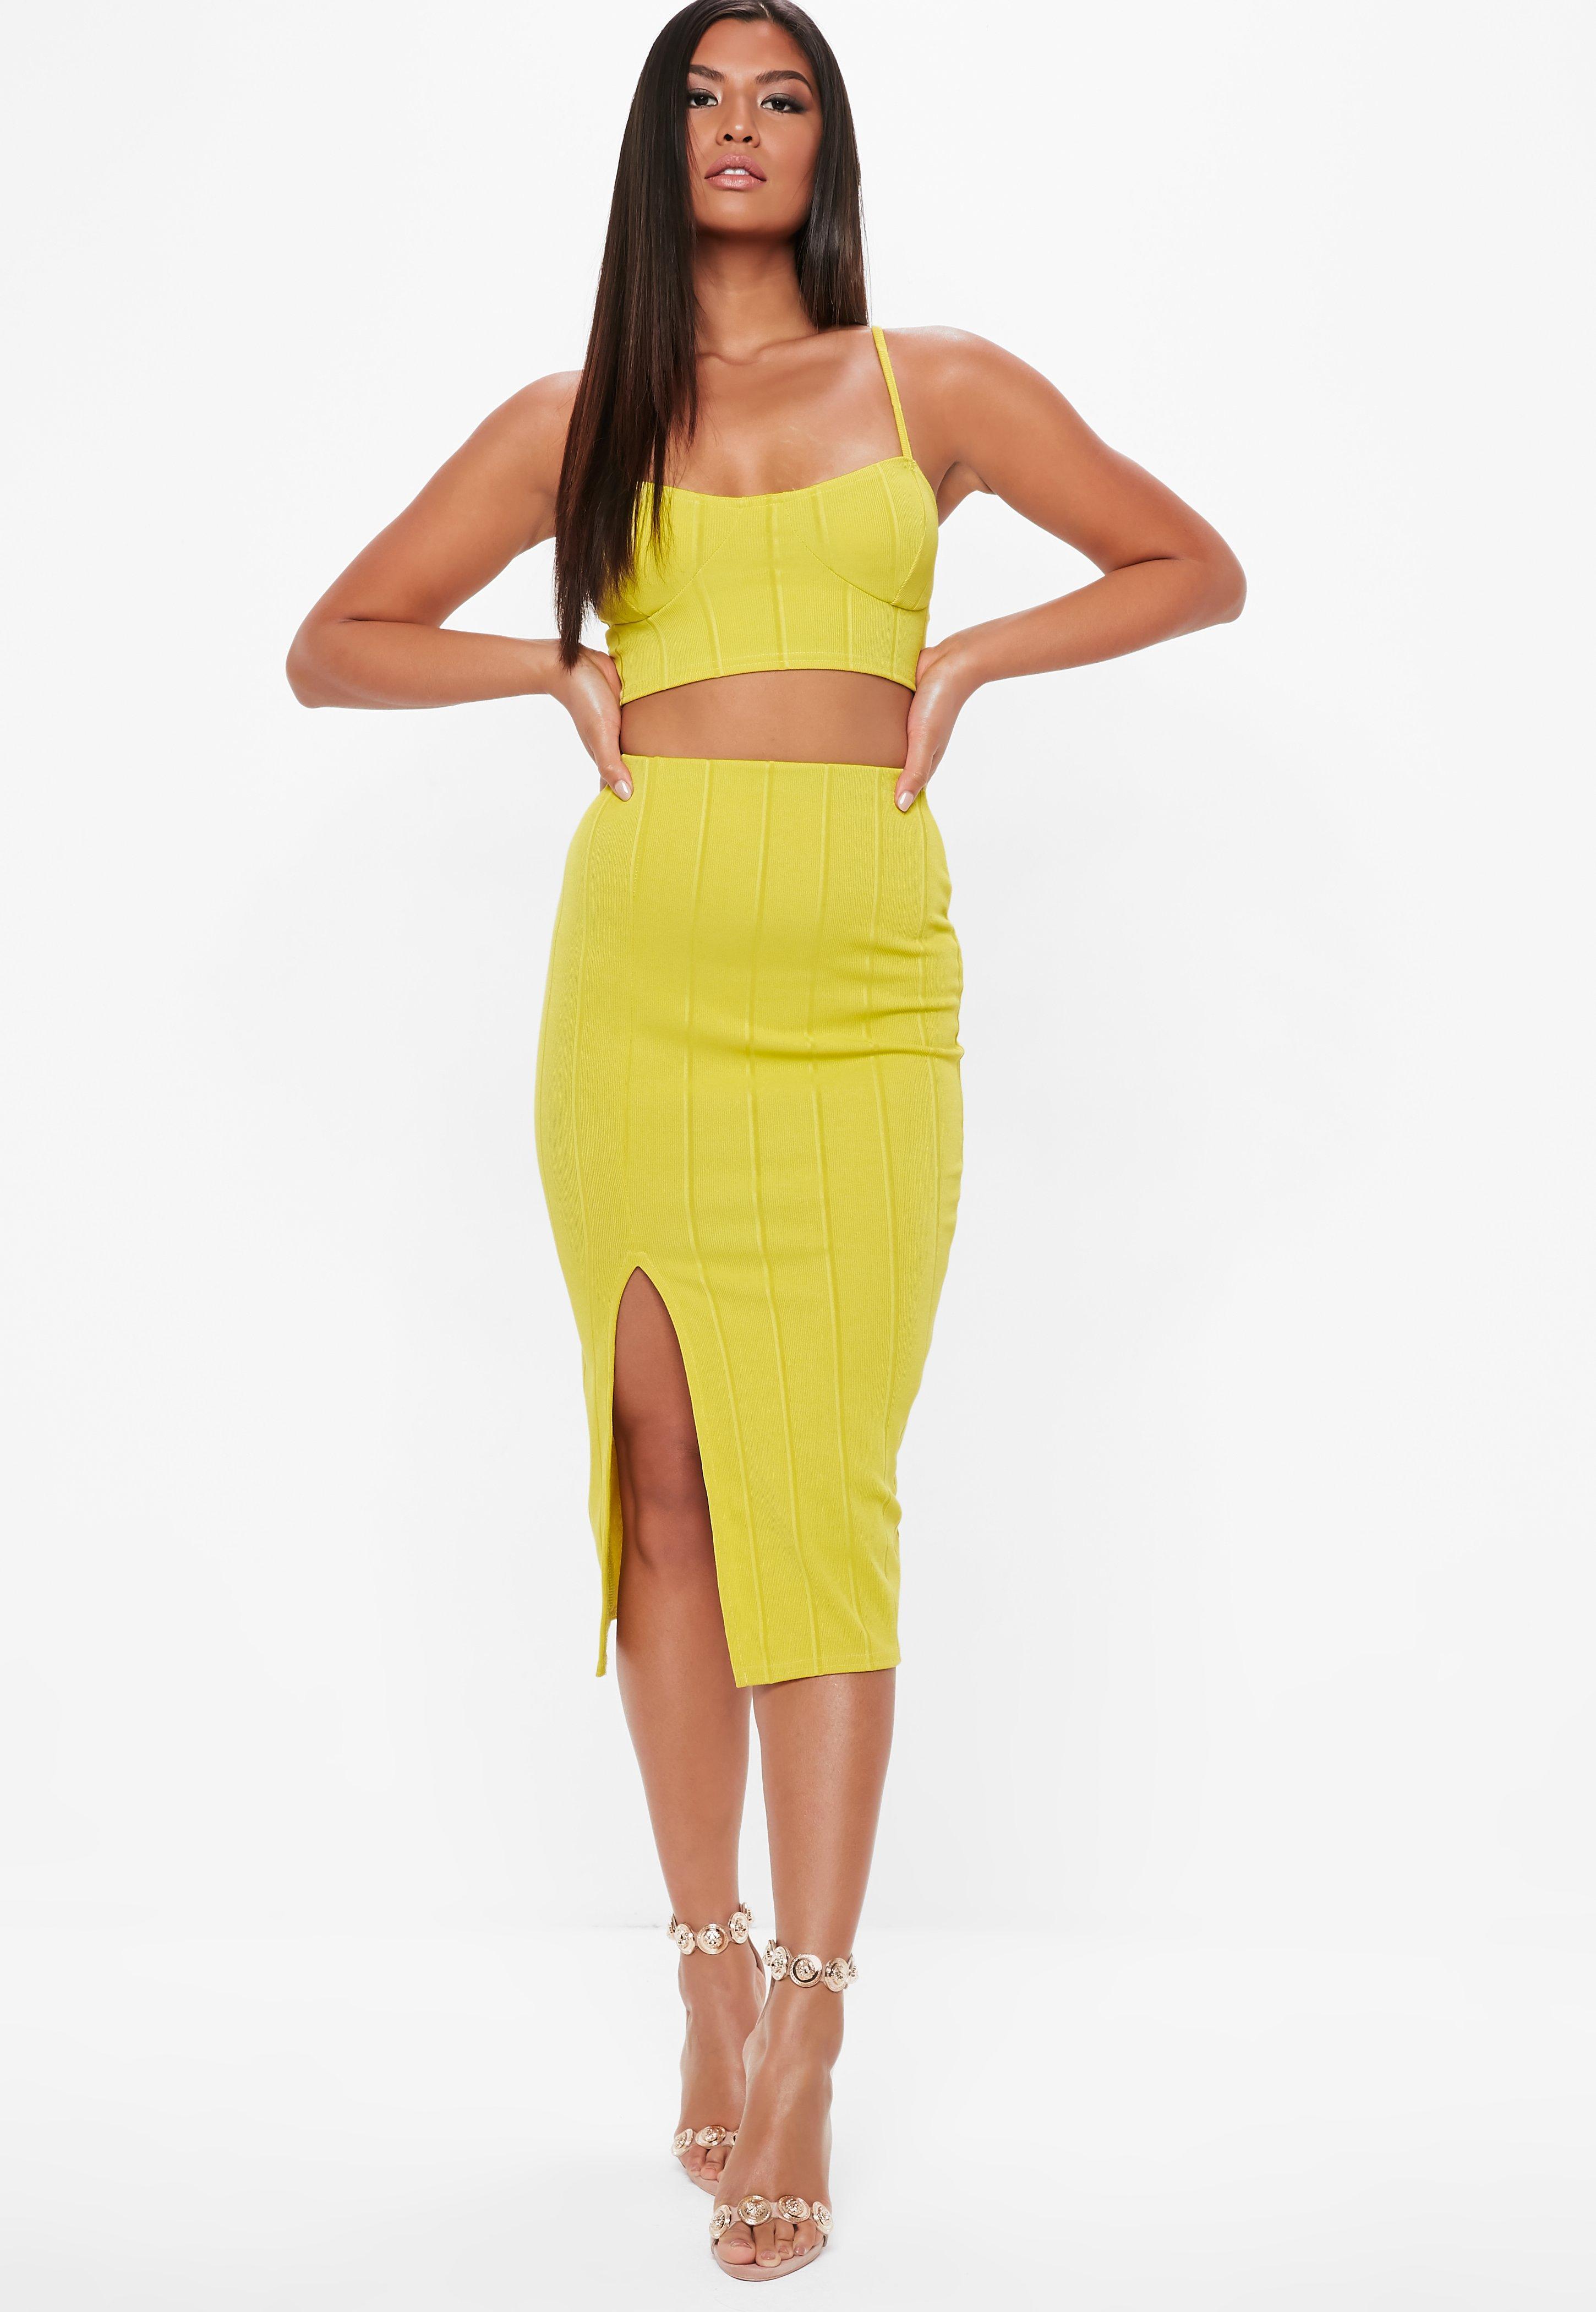 Discount Footlocker Outlet Good Selling Missguided Bandage Side Split Midi Skirt Visit New Cheap Online Buy Cheap Price r7ZlzhIX